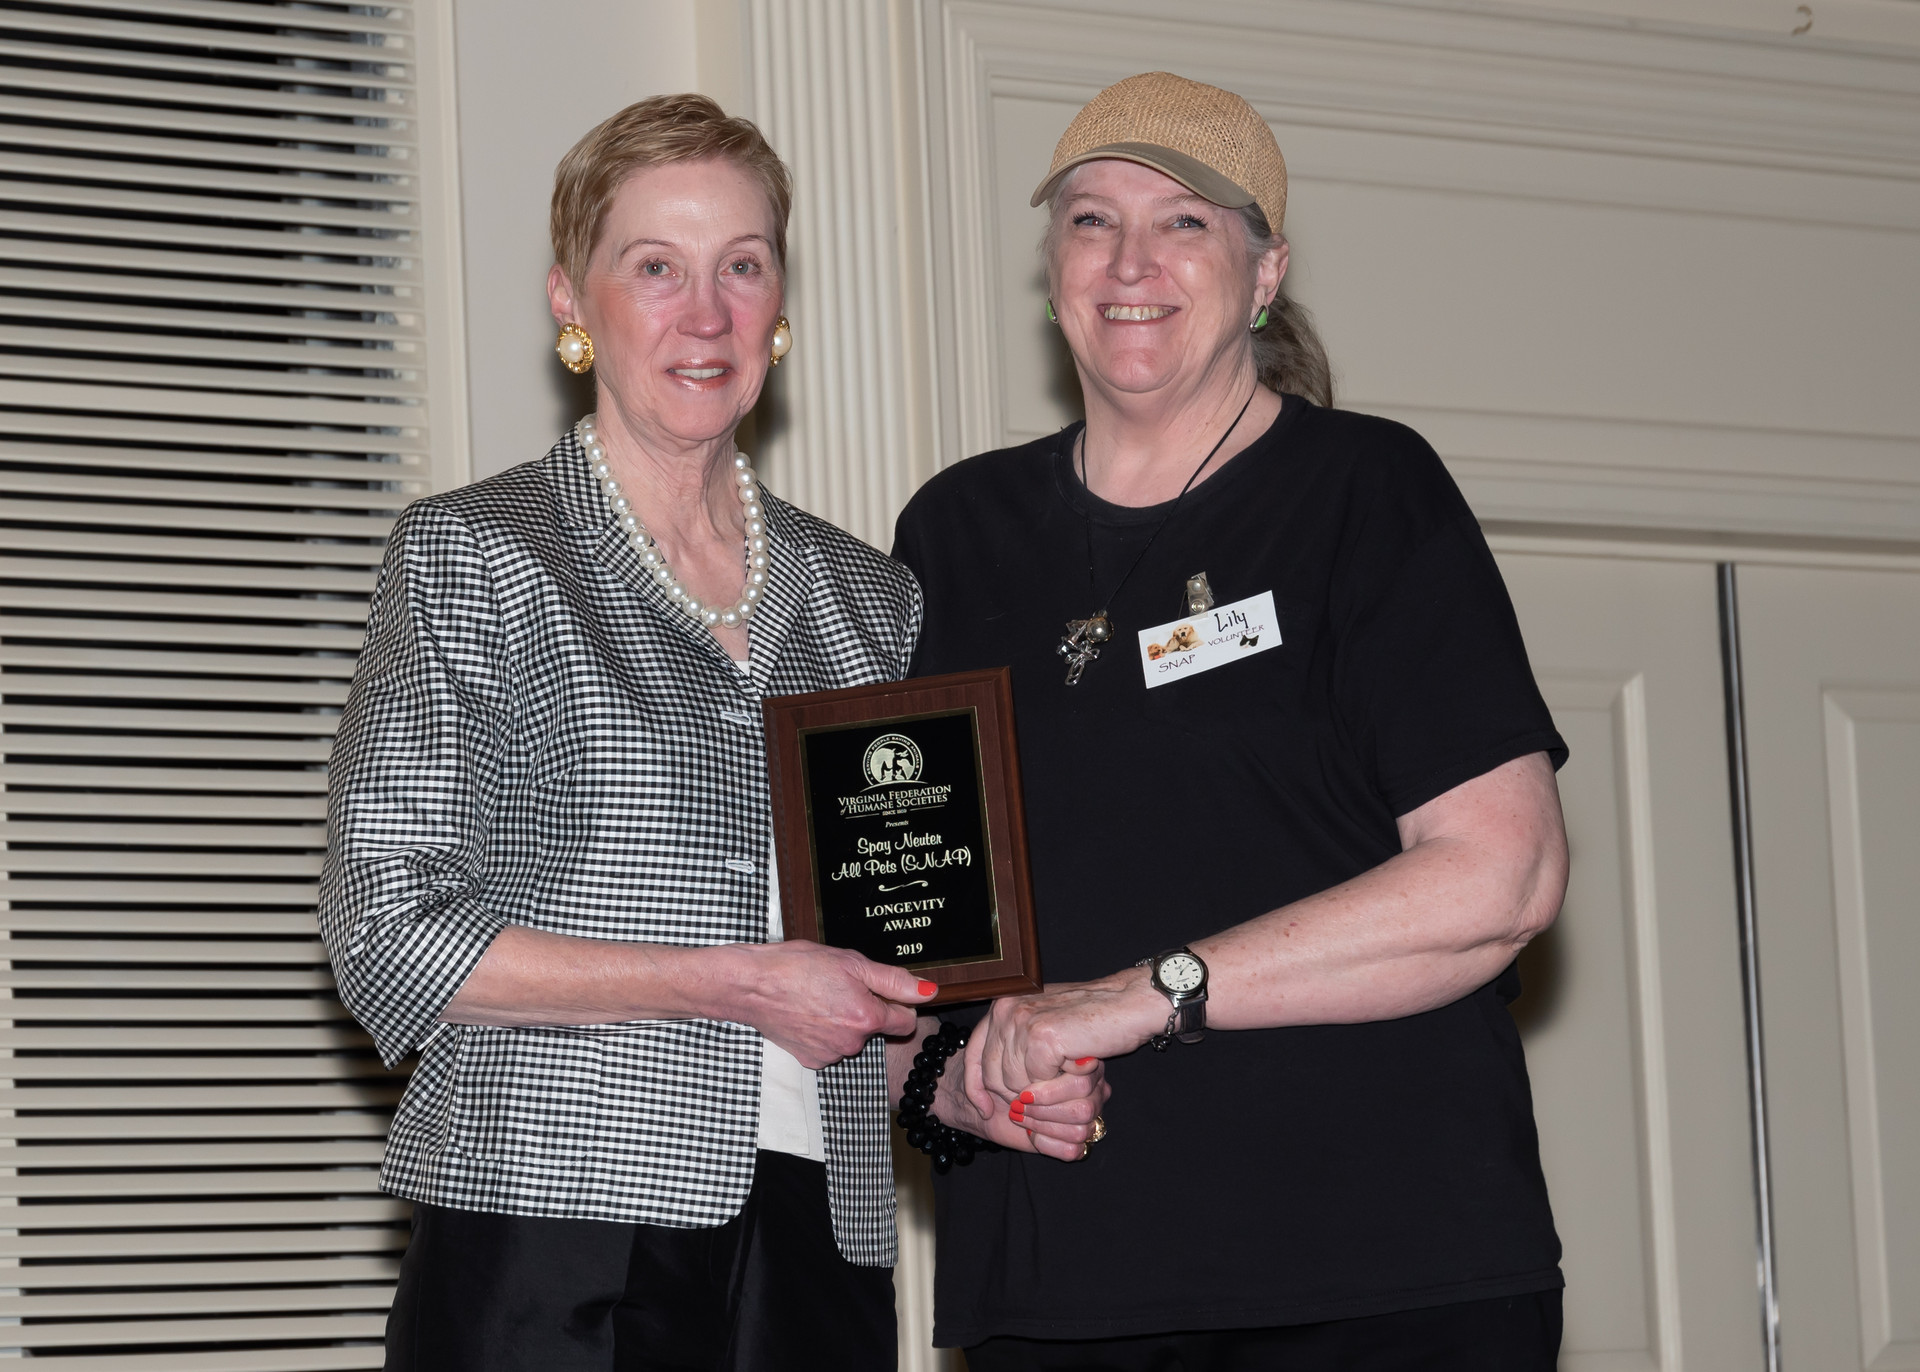 2019 VFHS Longevity Award